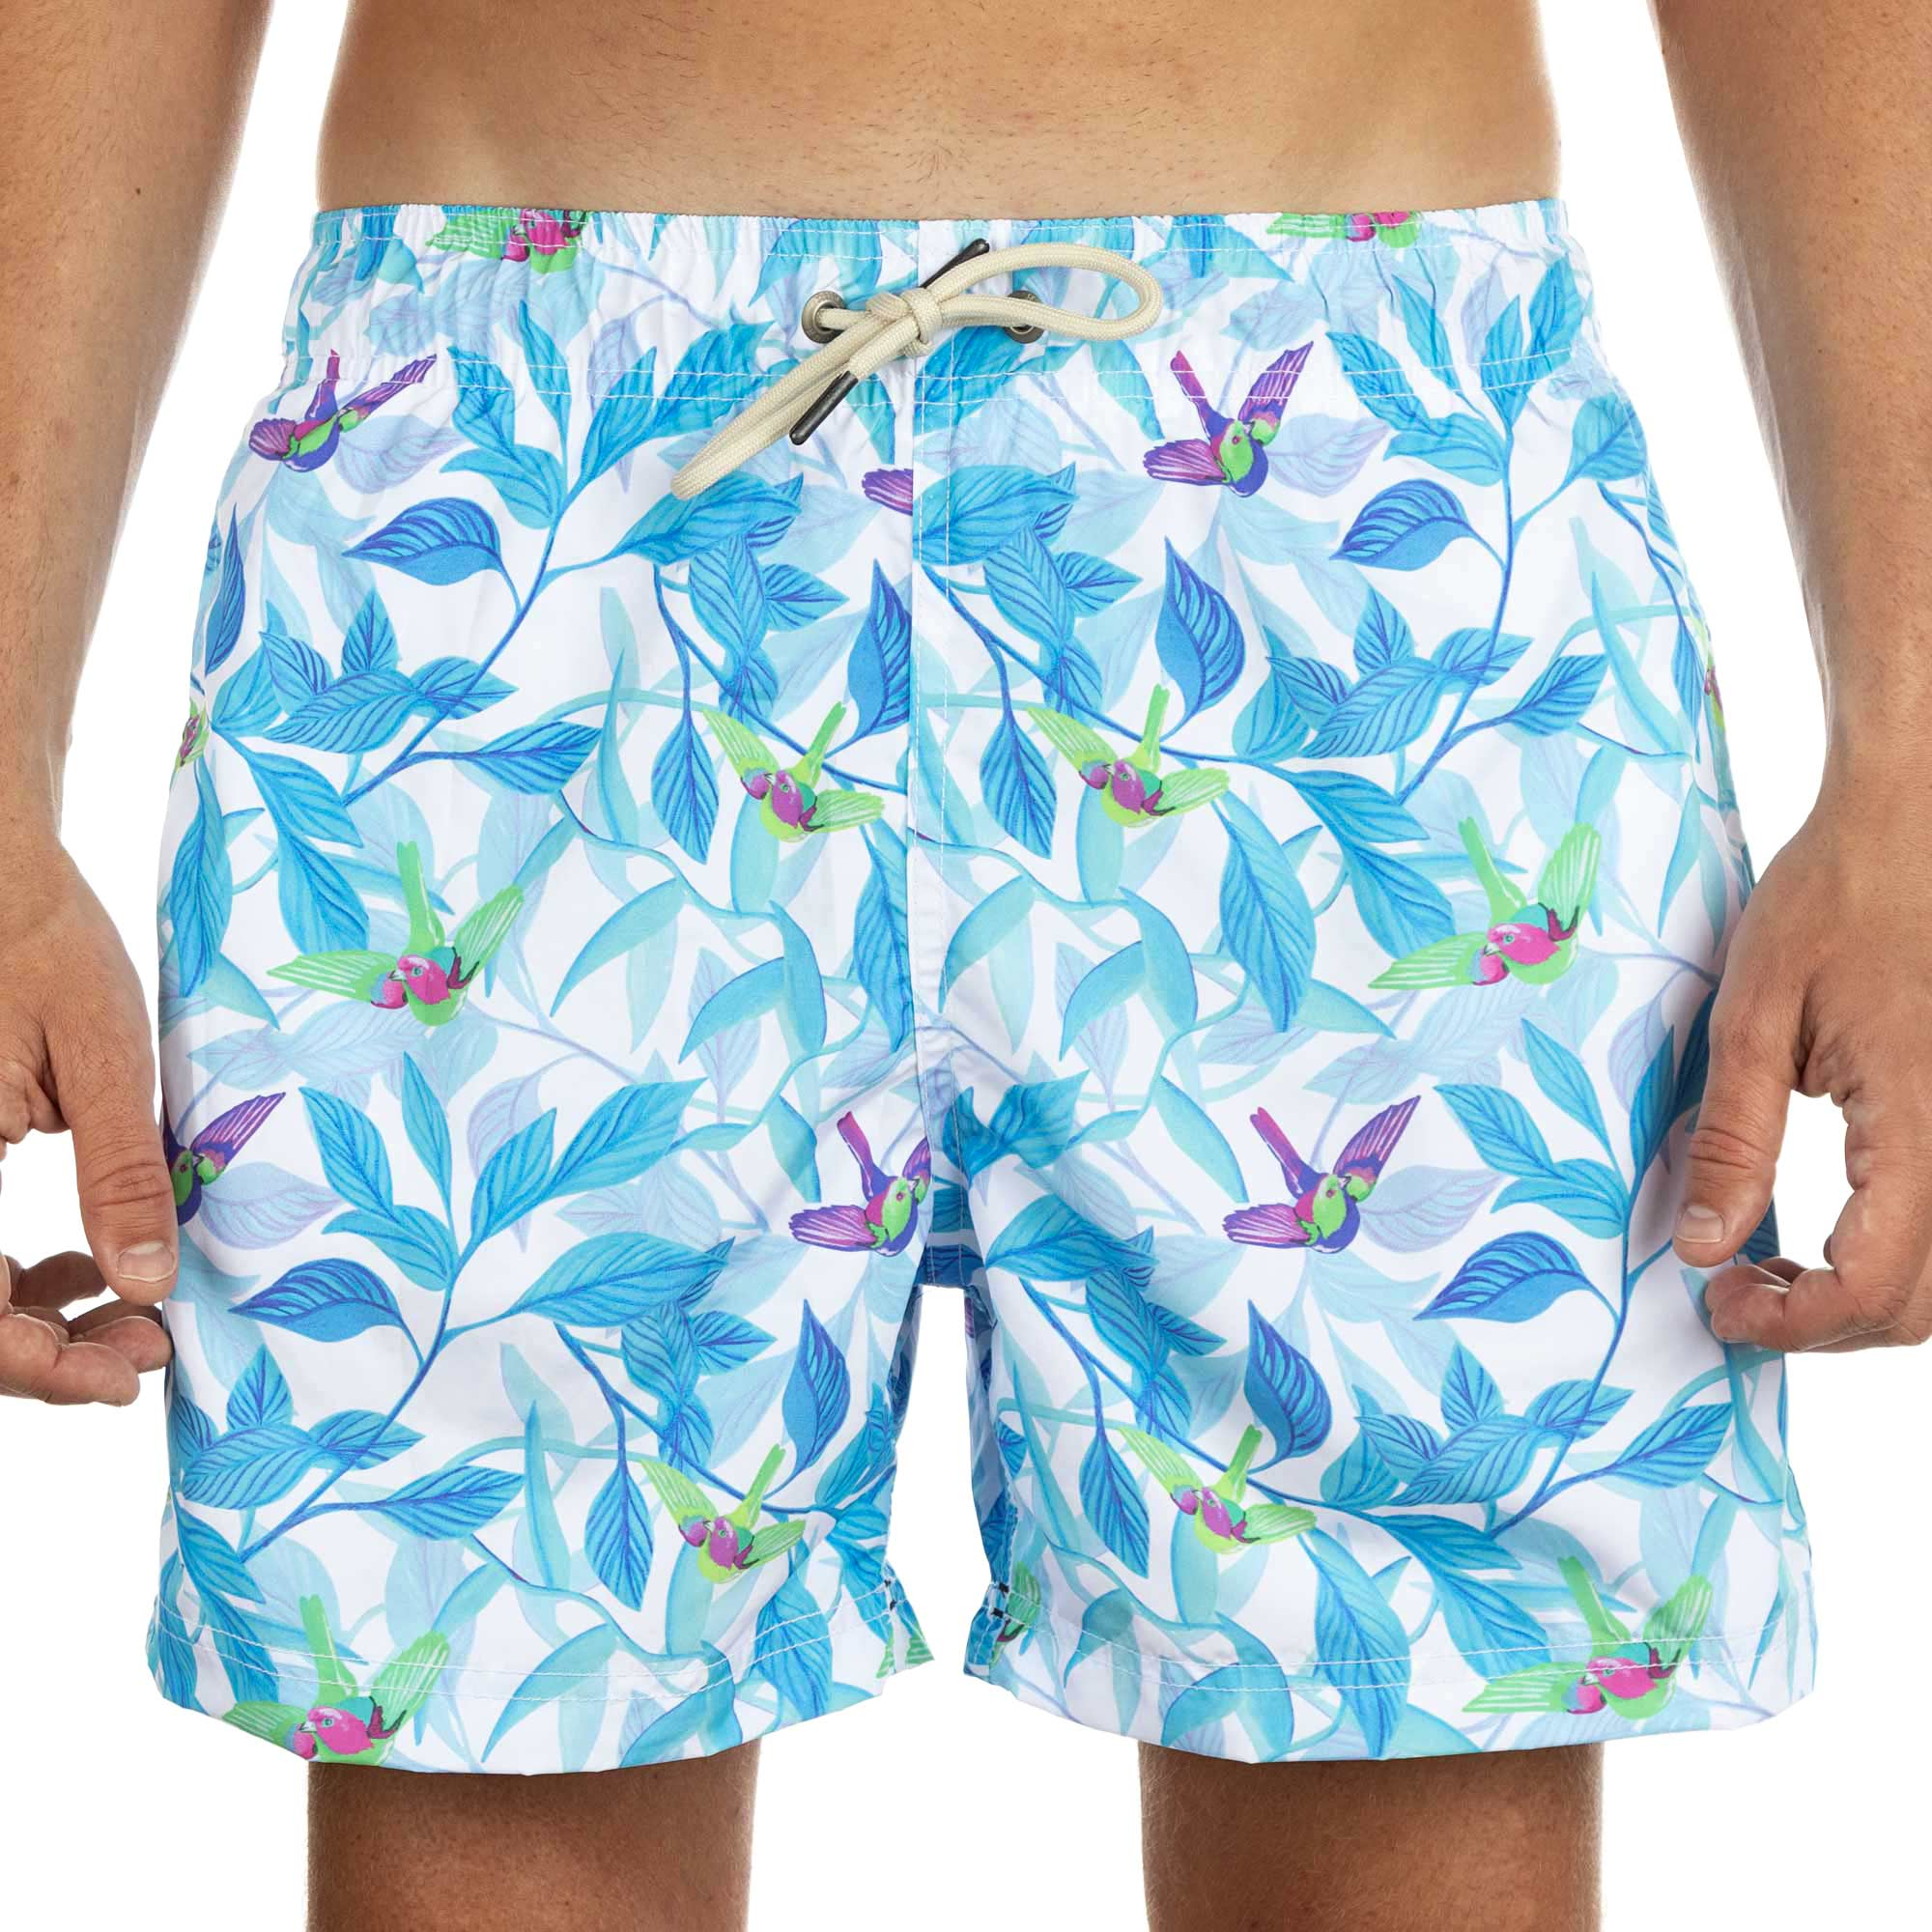 Shorts Co Shorts Especial Regular Blue Birds Adulto